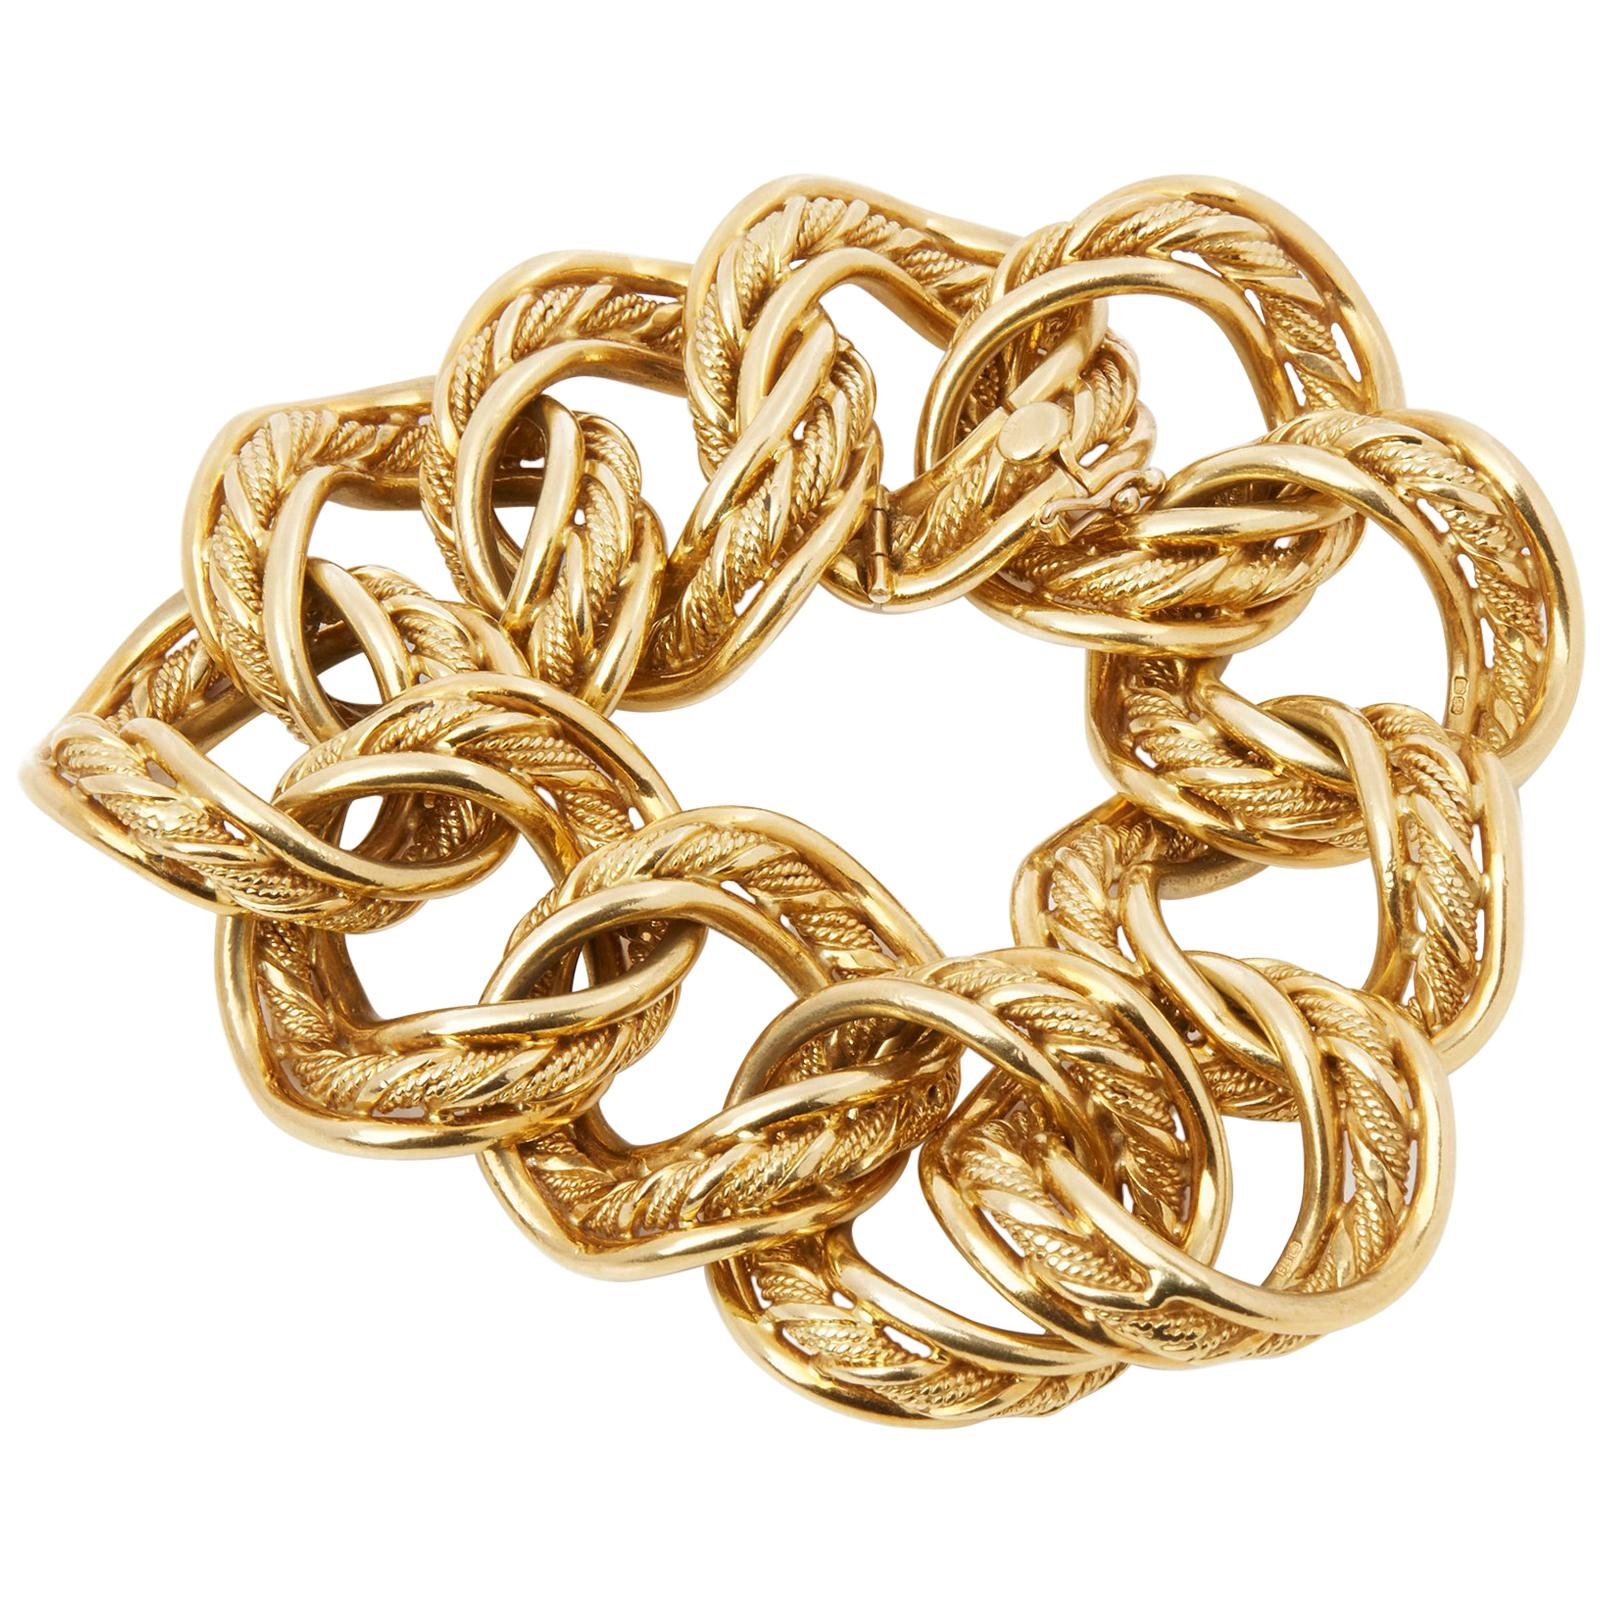 Kutchinsky 18 Karat Yellow Gold 1960's Heavy Link Vintage Bracelet